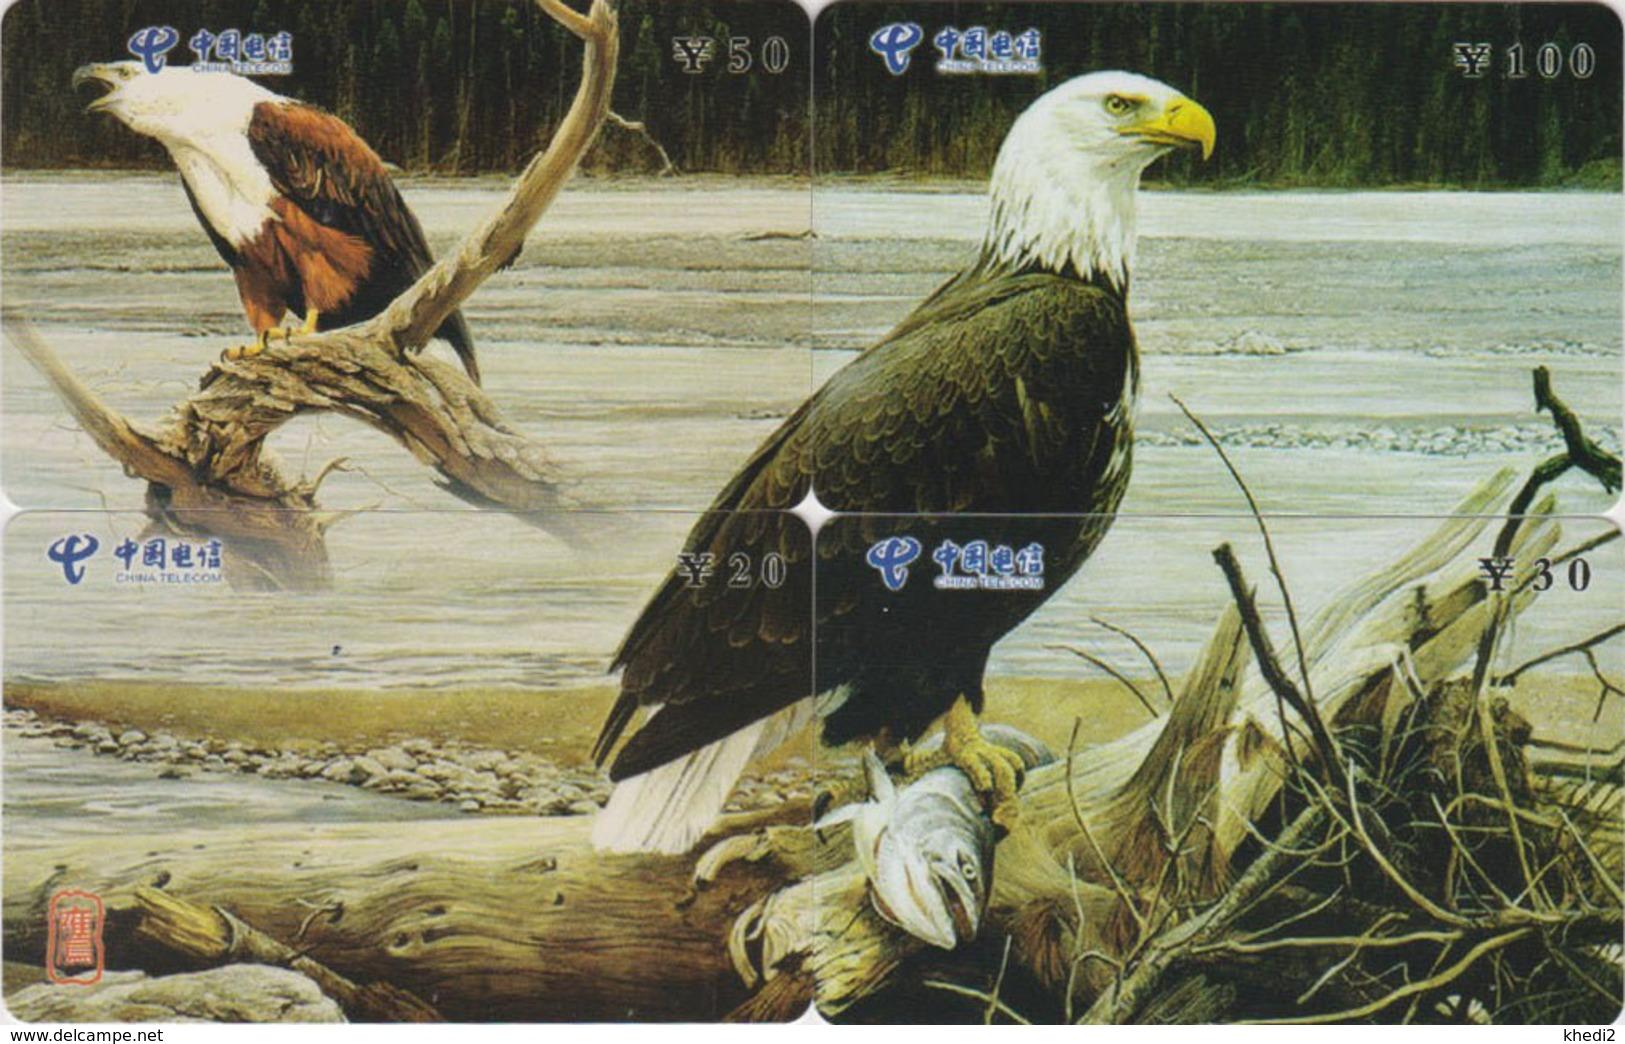 PUZZLE De 4 TC Chine - ANIMAL - OISEAU Rapace - AIGLE - AFRICAN FISH EAGLE BIRD Phonecards Telefonkarten - 4505 - Puzzles